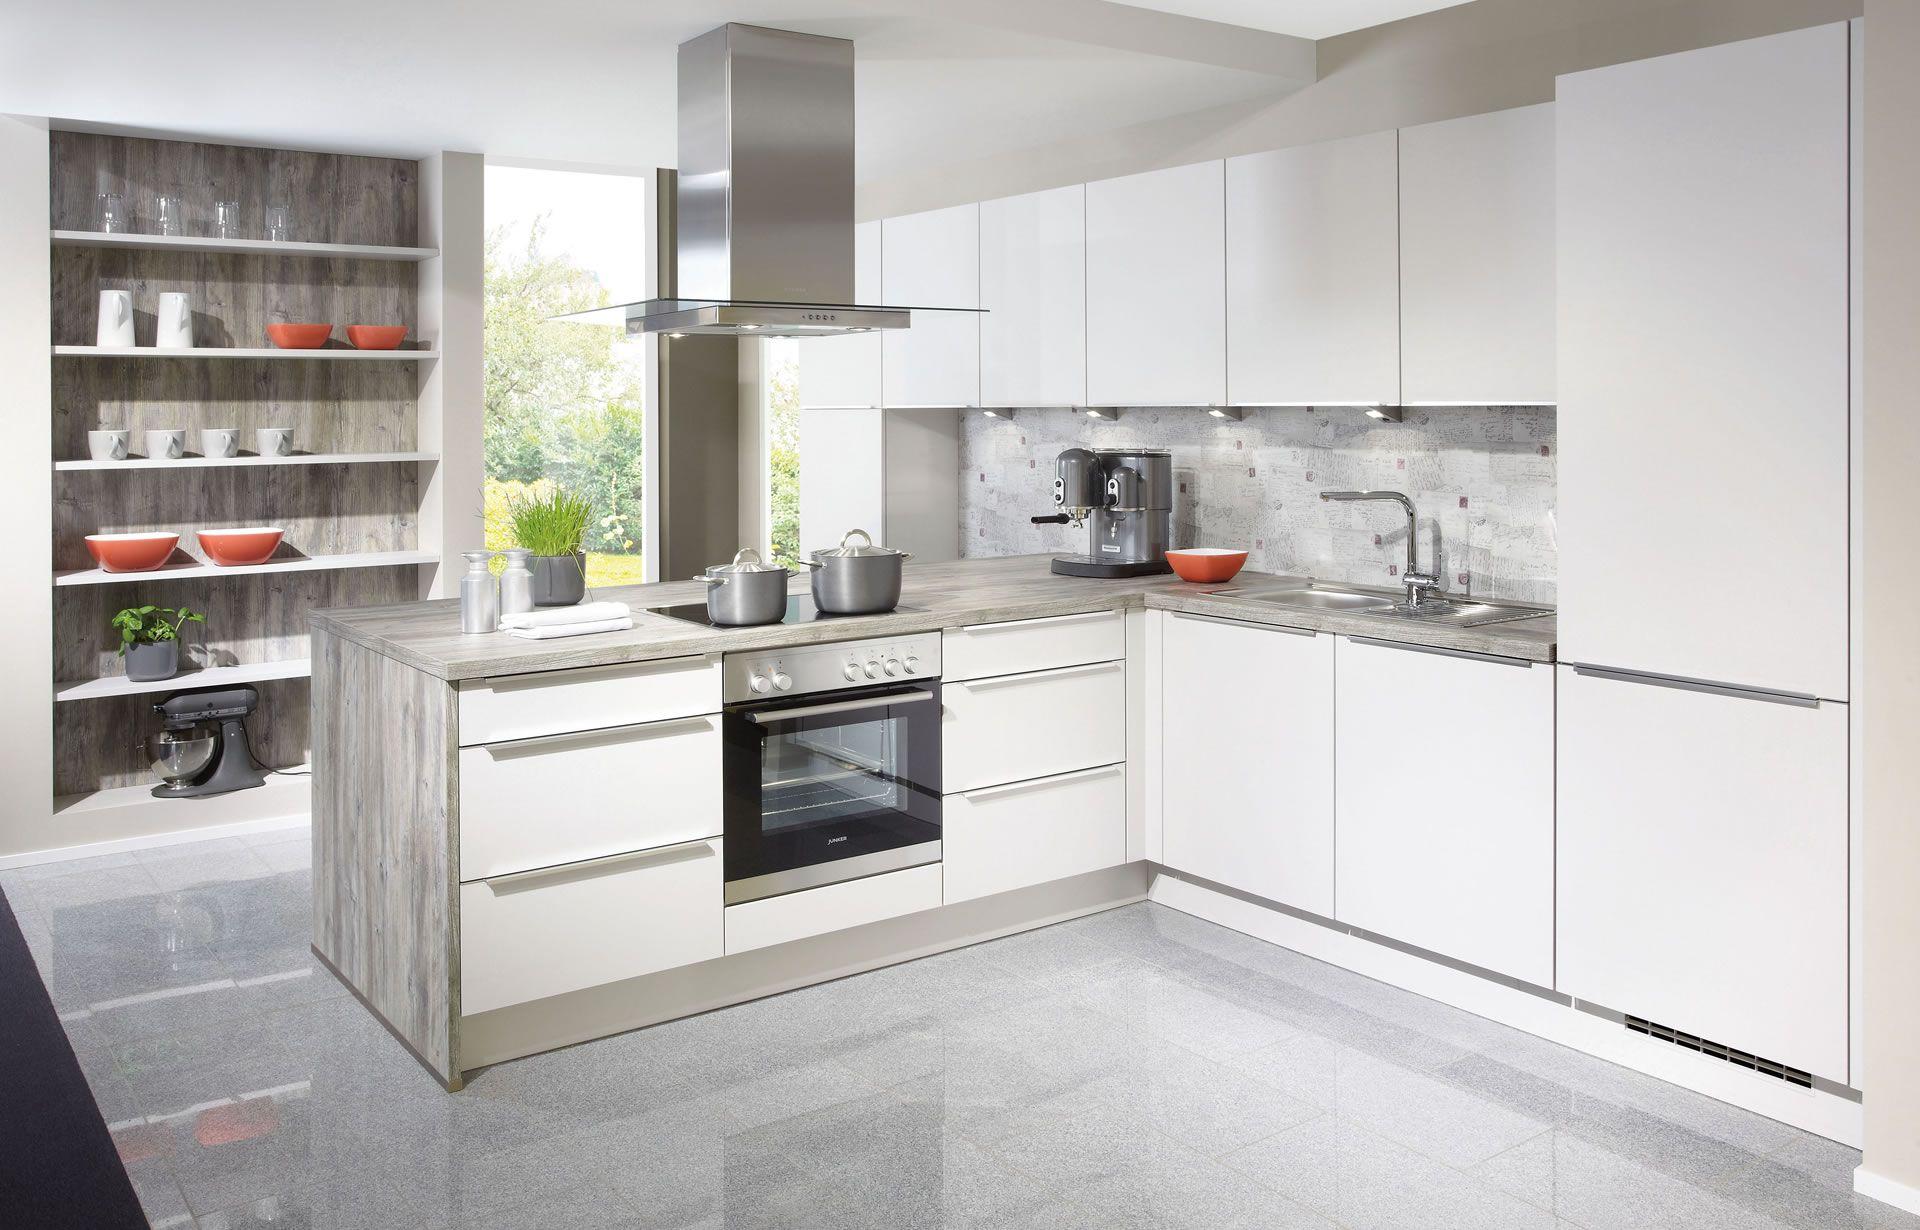 nobilia Küchen - cuisines - nobilia | Produkte | Cuisines ... | {Nobilia küchen 1}